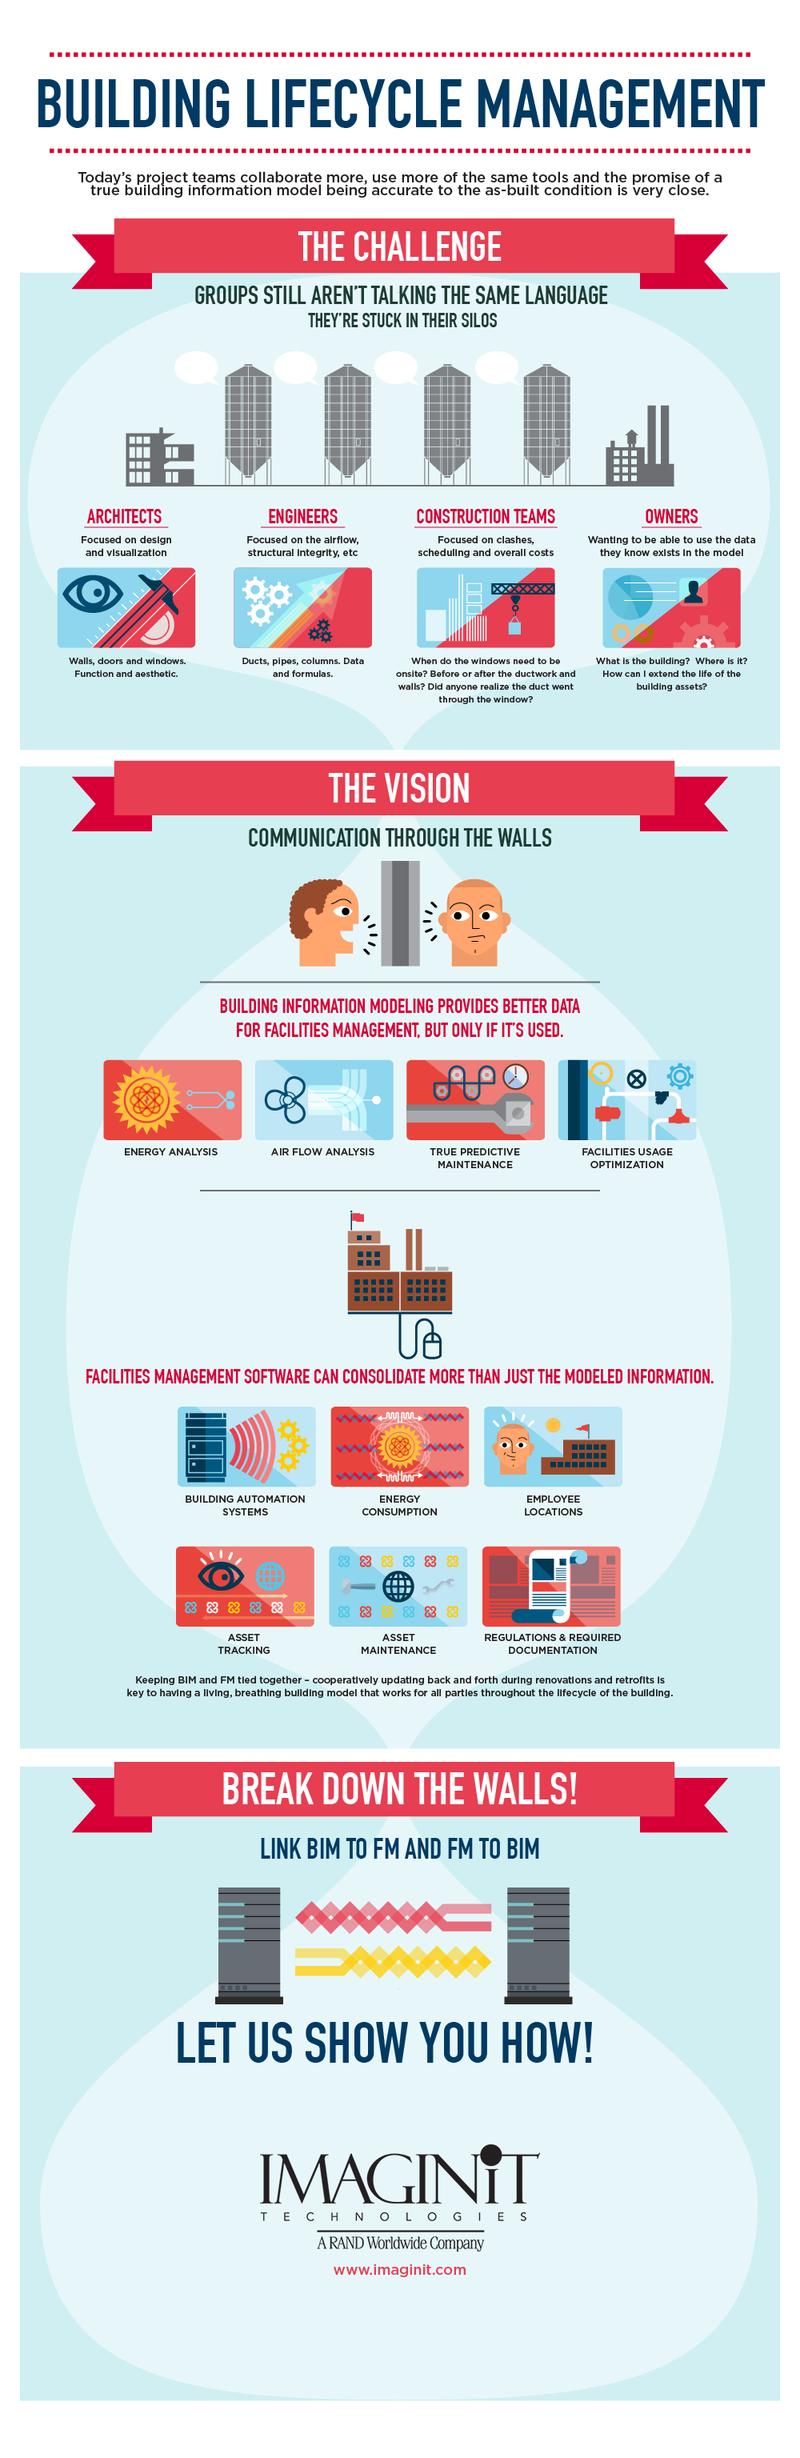 IMAGNIiT_Building-Lifecycle-Management-Explained